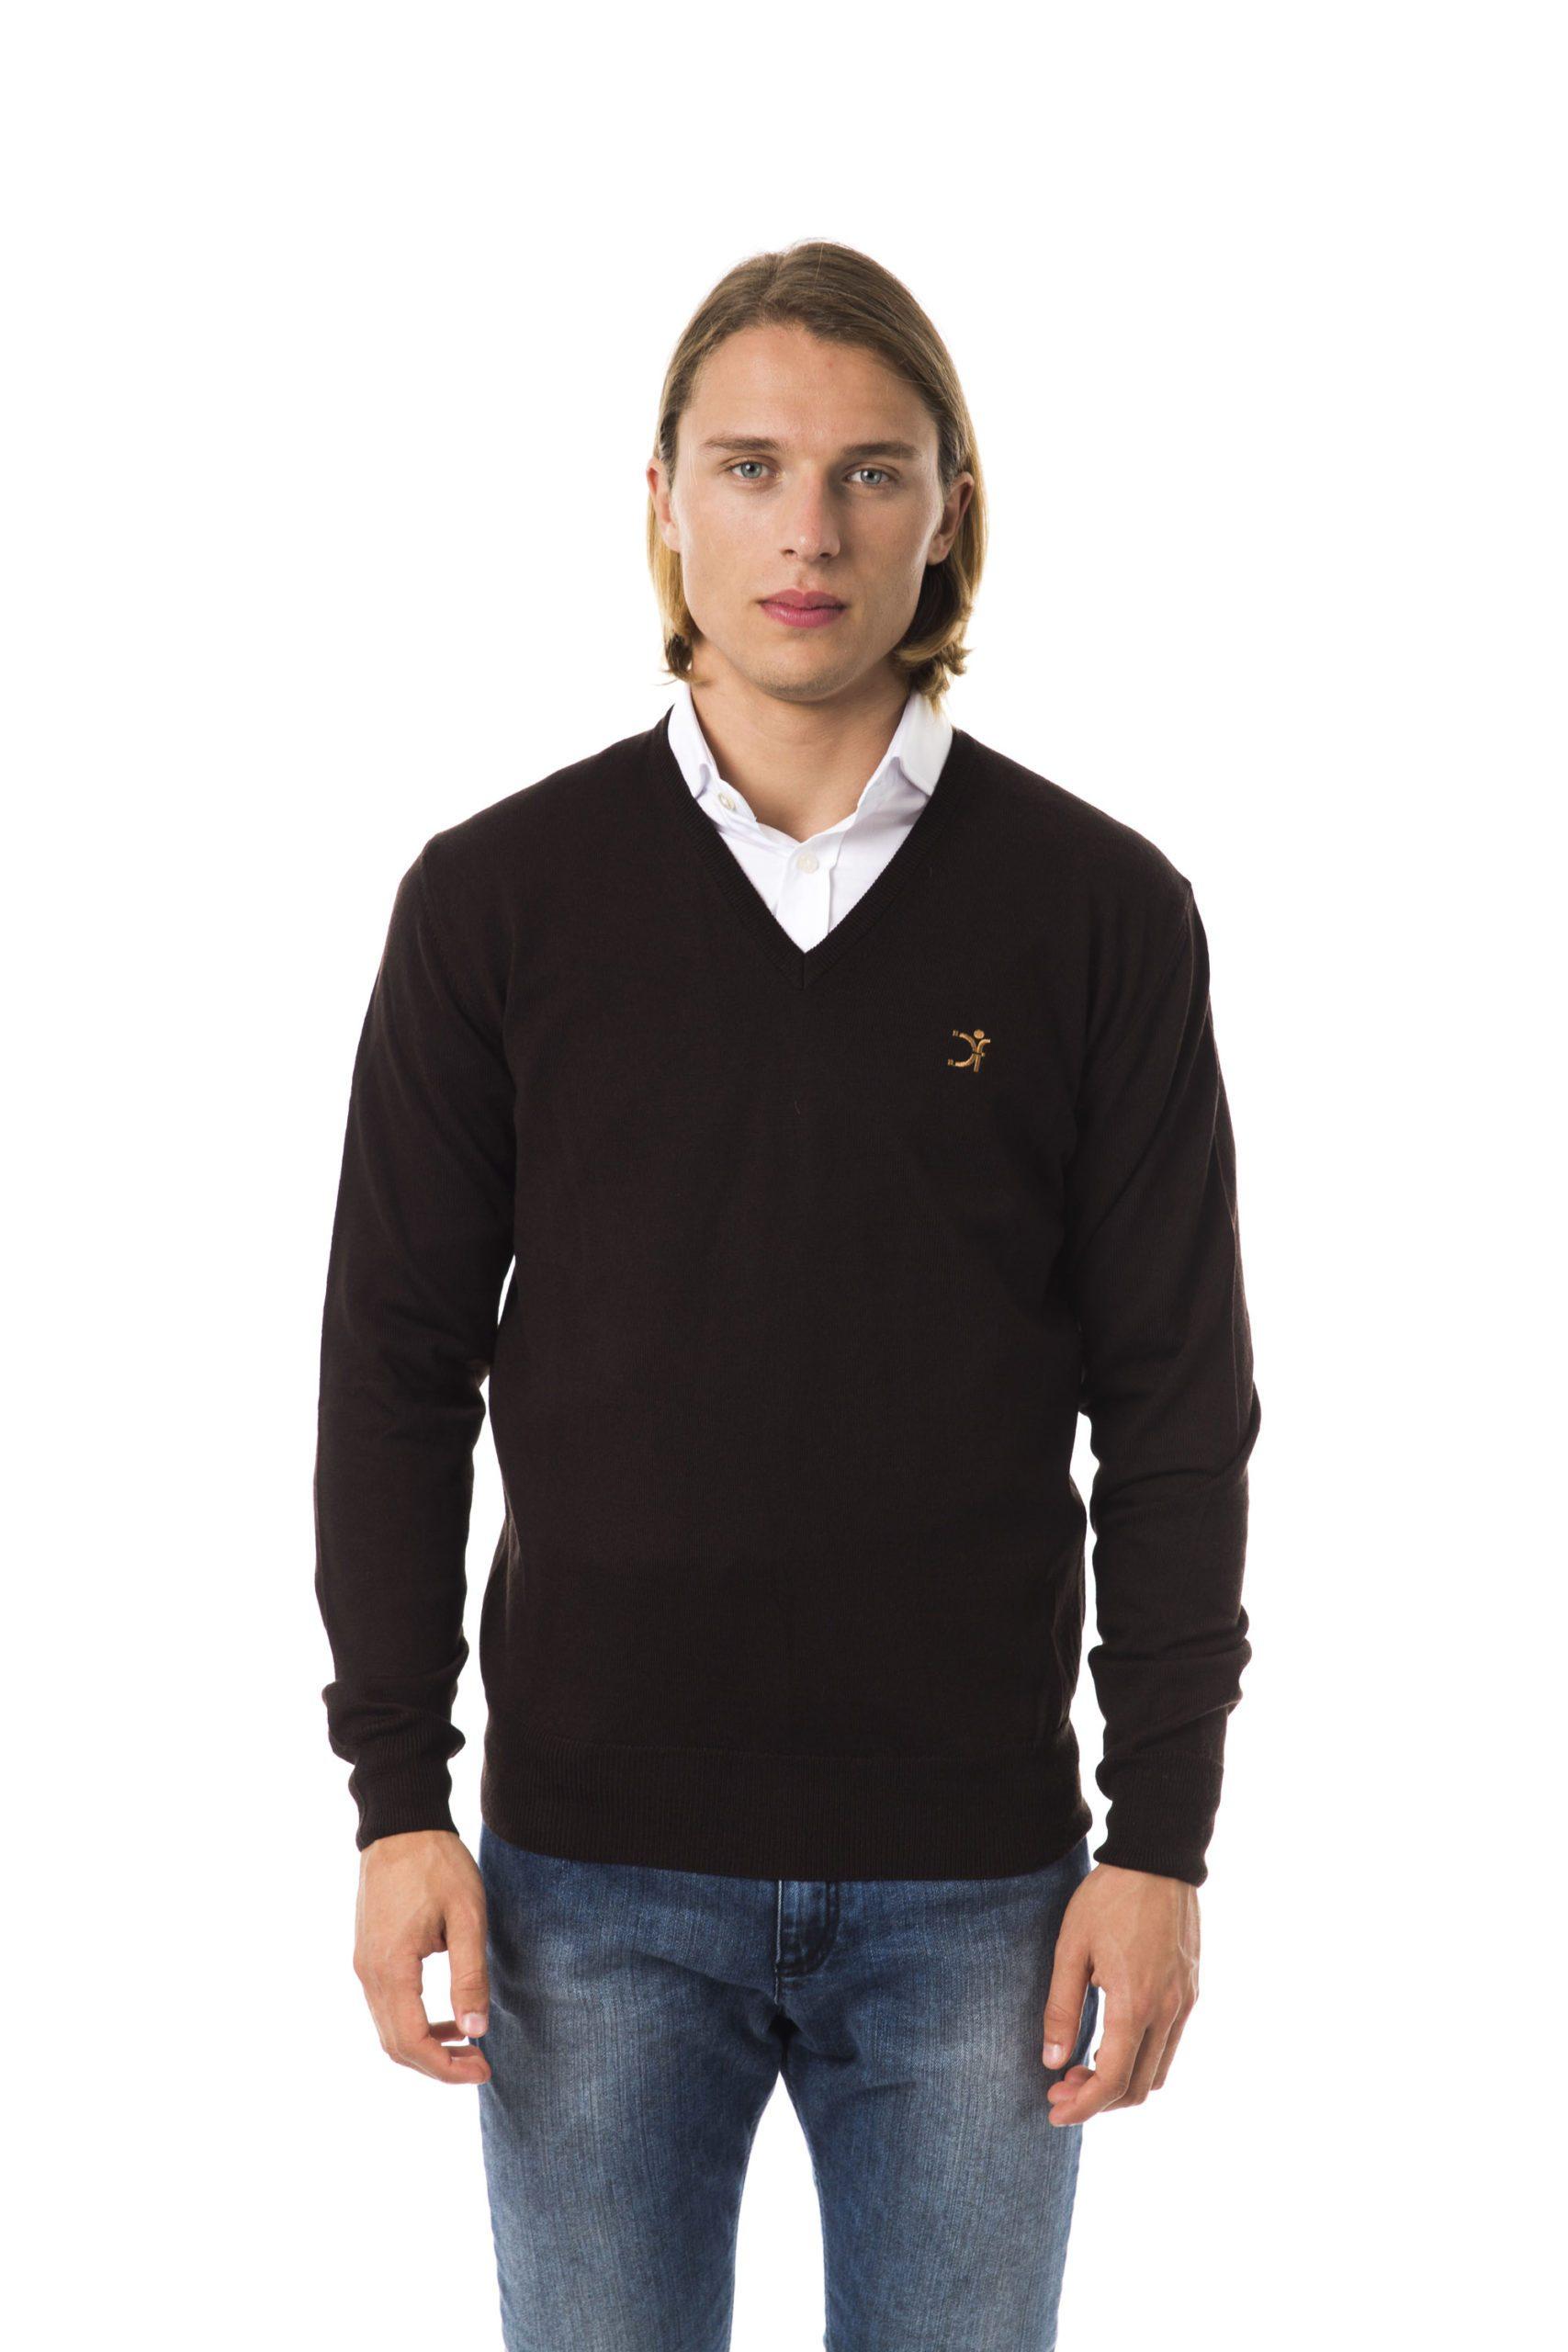 Uominitaliani Men's Moro Sweater Brown UO816114 - S